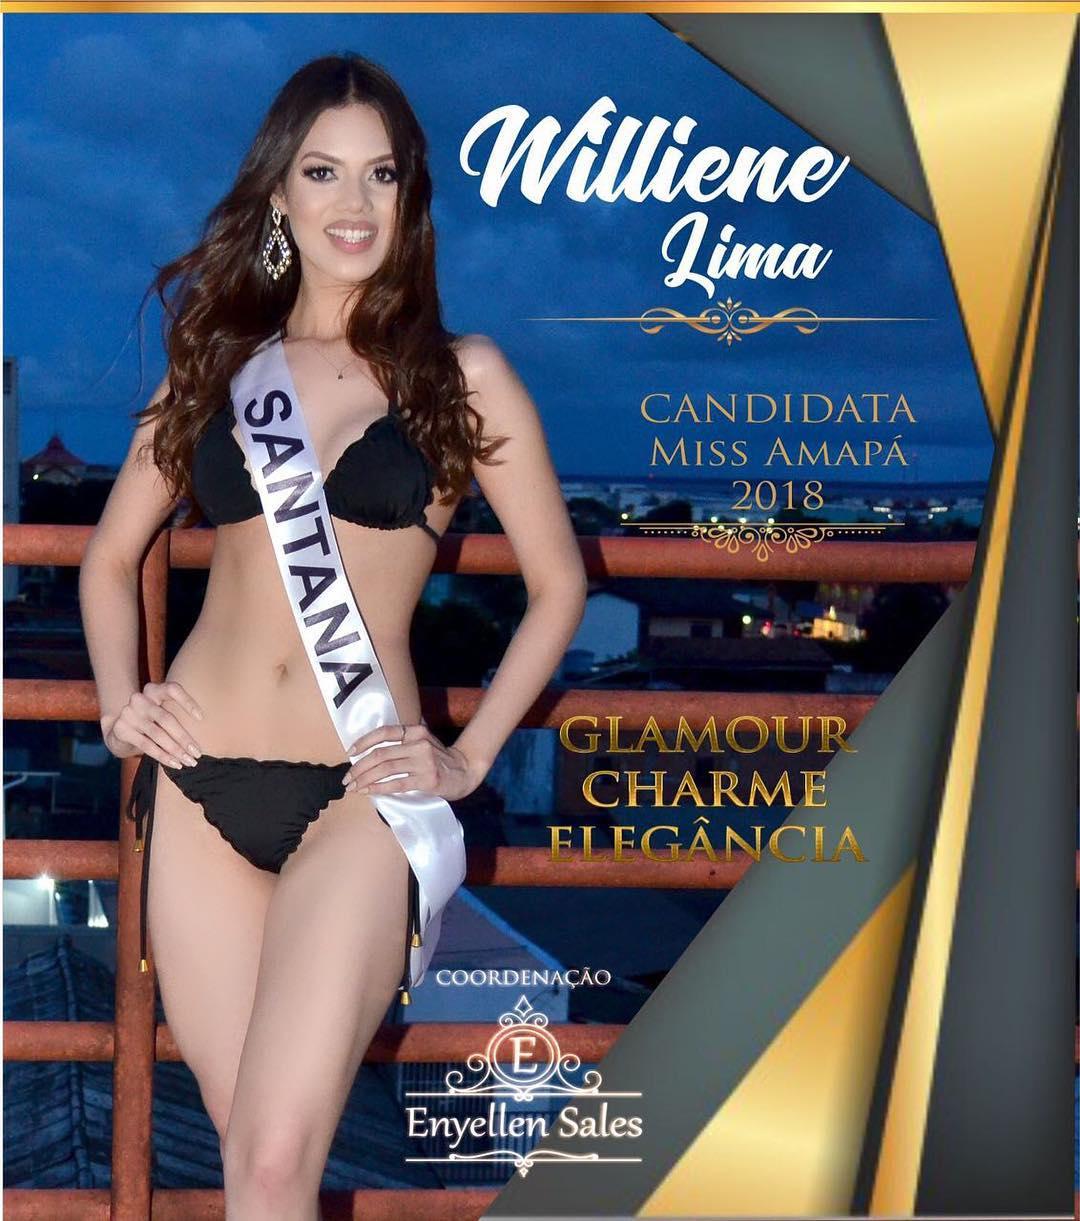 williene lima, miss amapa universo 2018. - Página 2 30087510